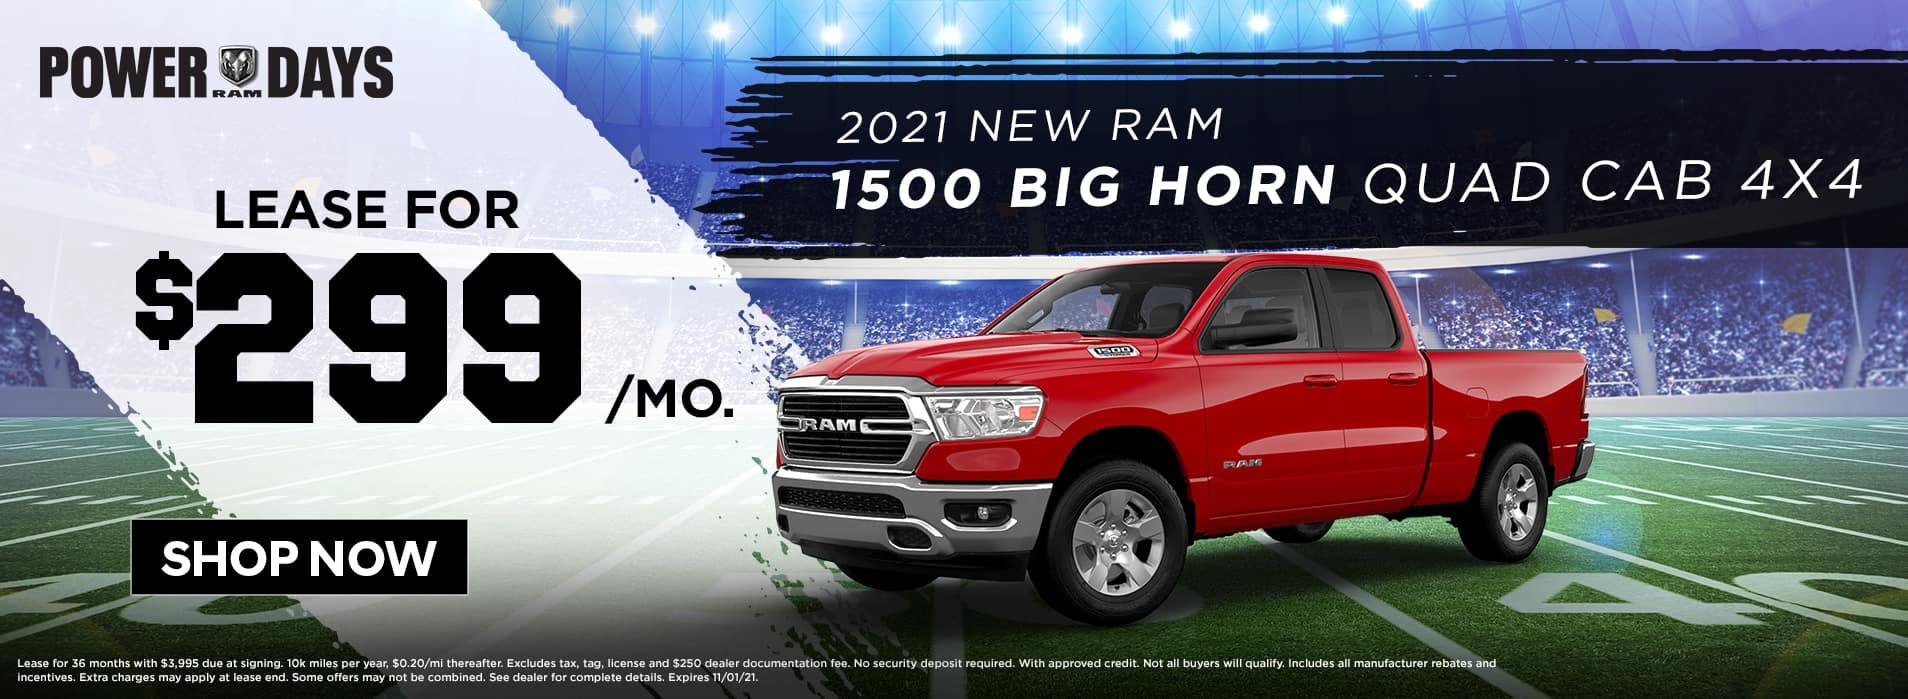 124-1021-SCO5101_1500 Big Horn